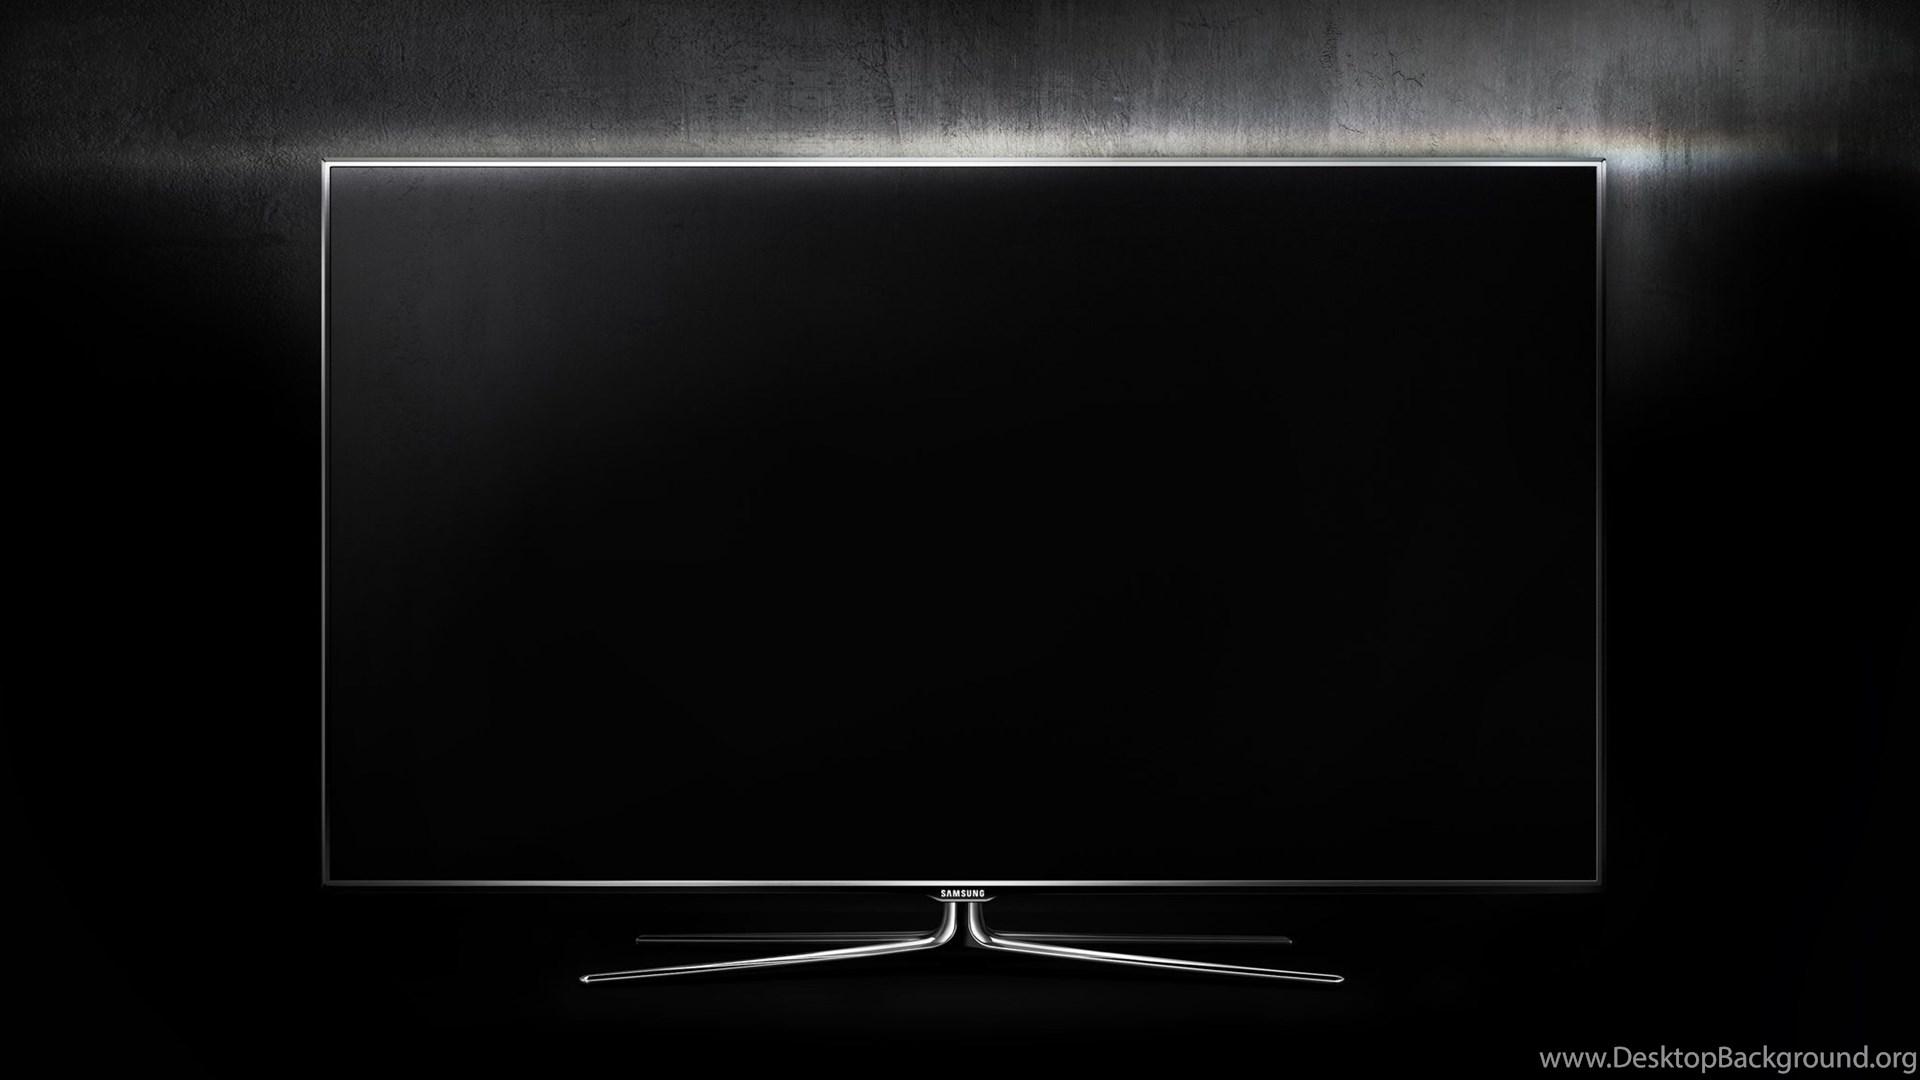 Monitor Samsung Black Black Screen Display Wall Hd Wallpapers Desktop Background